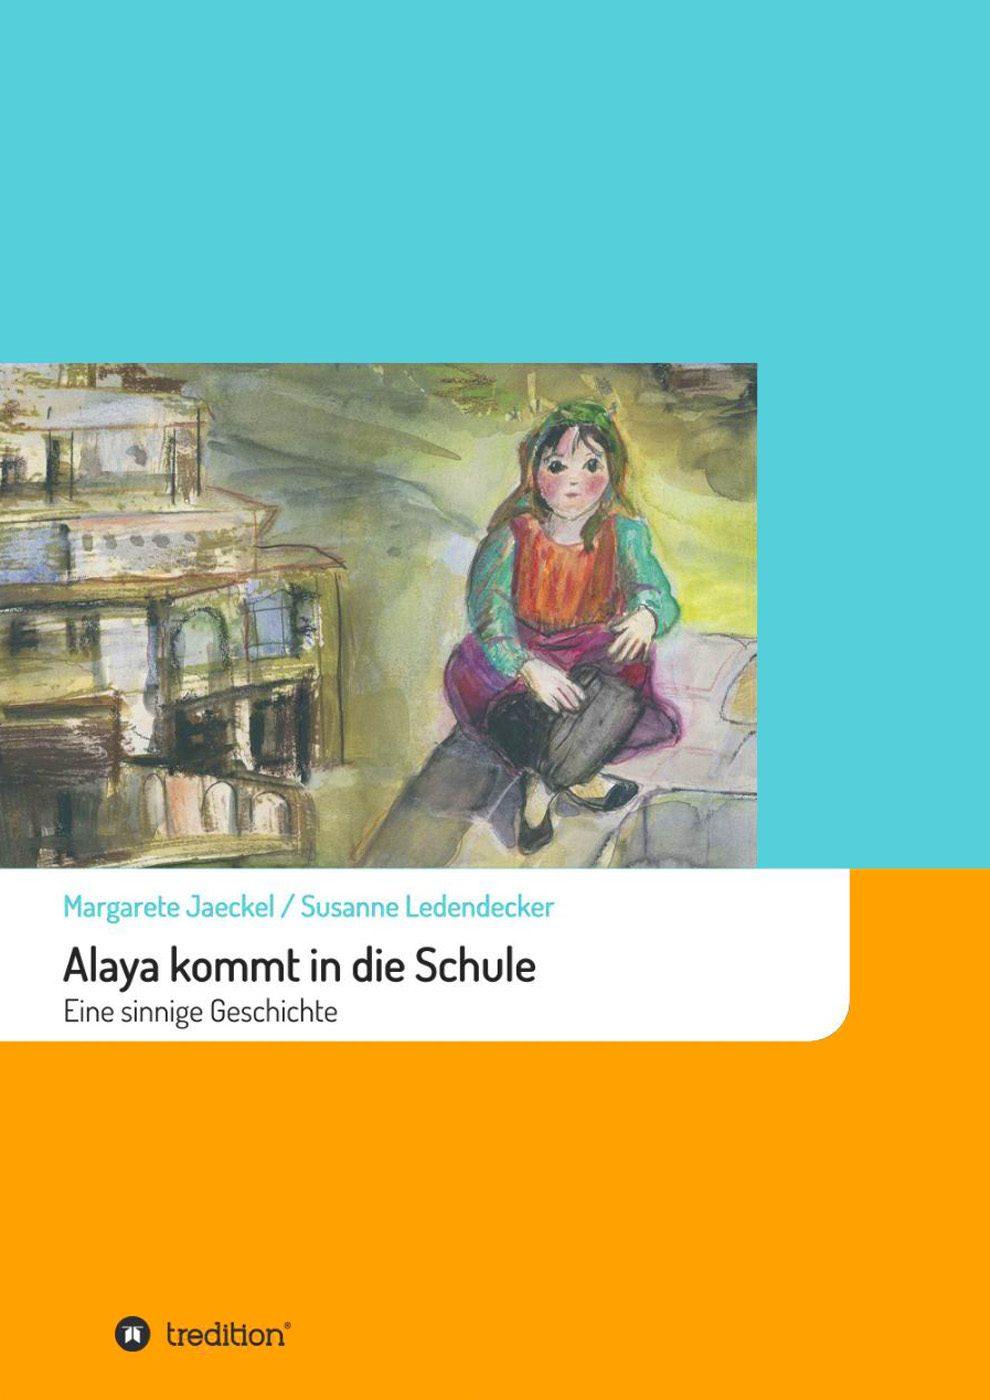 Aleia kommt in die Schule| Sinnige Geschichten | Margarete Jaeckel